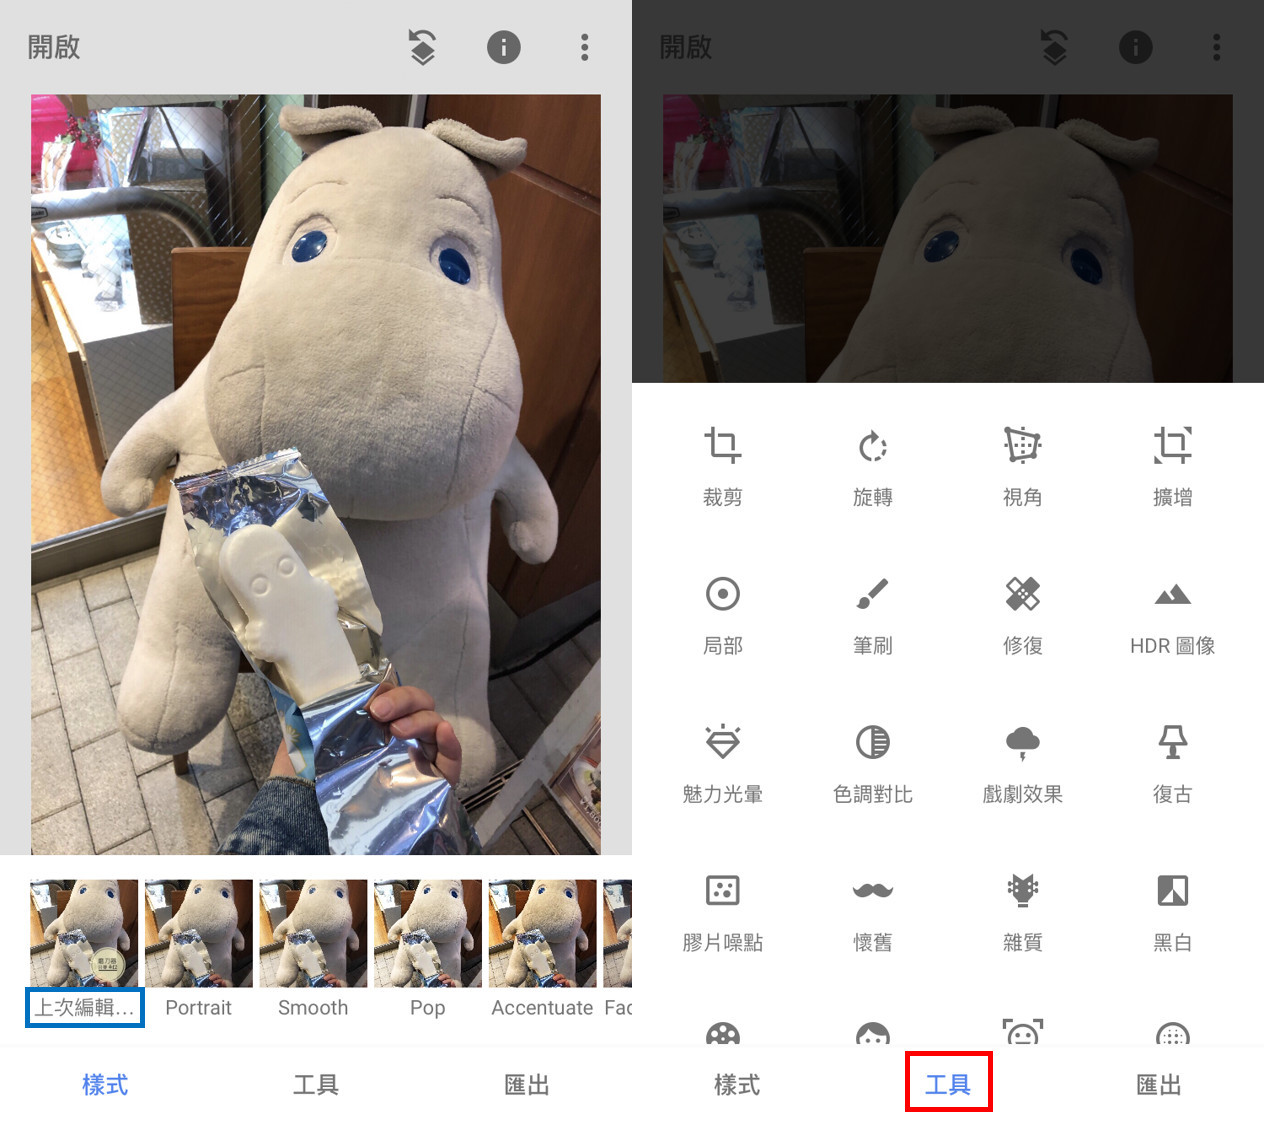 Snapseed編輯頁面-鯊客科技SEO網頁設計公司